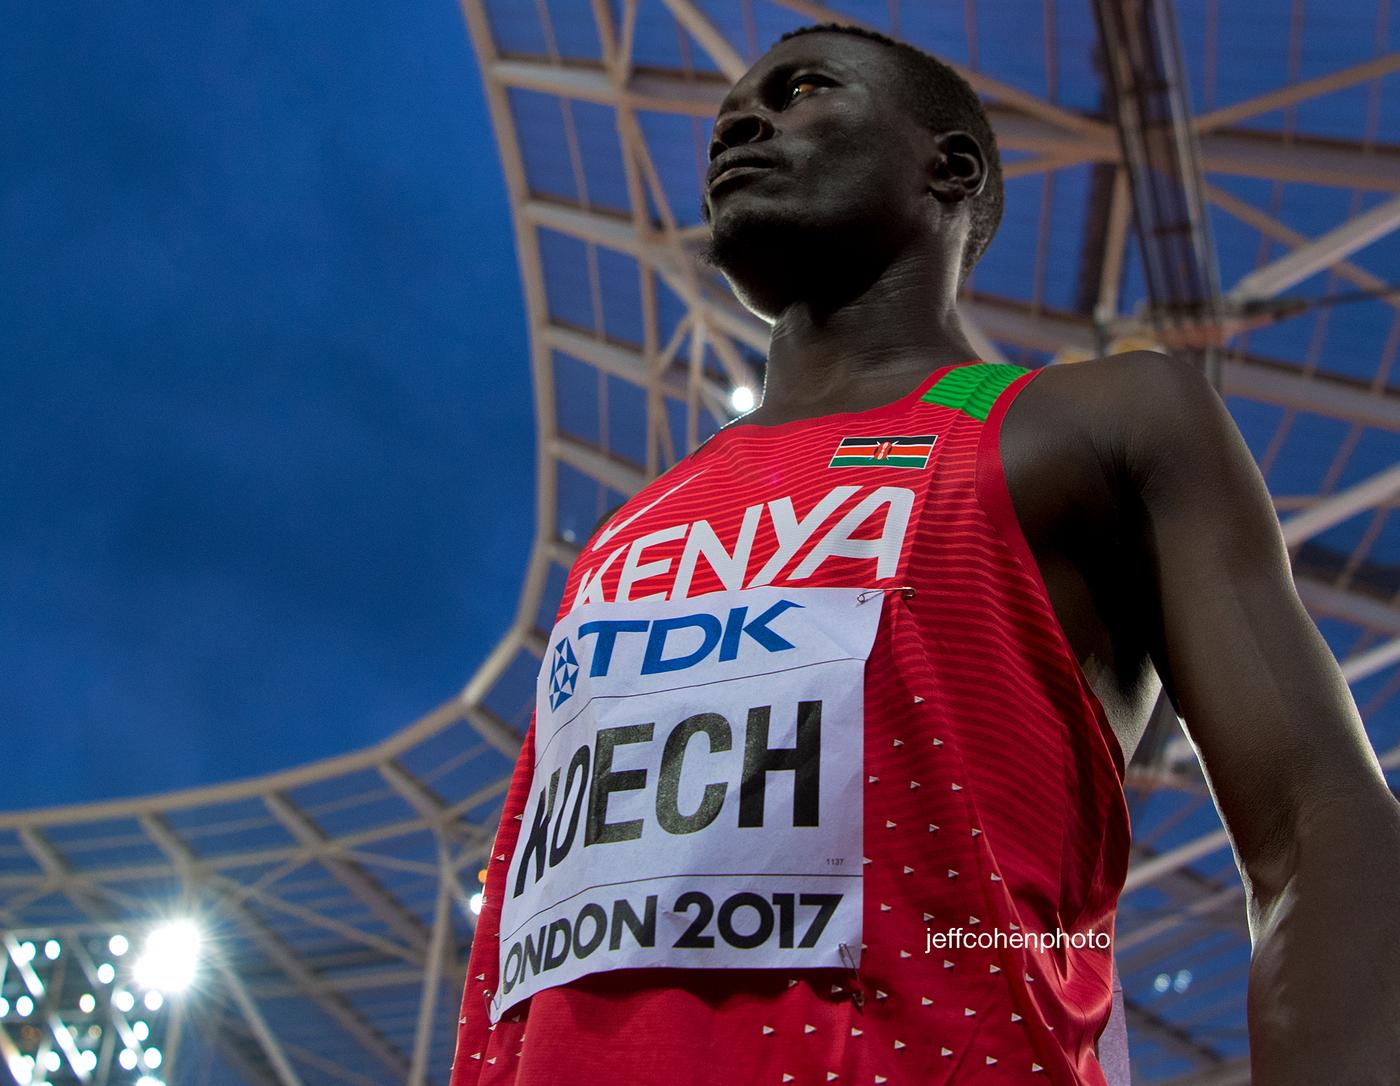 2017-IAAF-WC-London-night-4-haron-koech-400mh-kenya-4262-jeff-cohen-photo--web.jpg